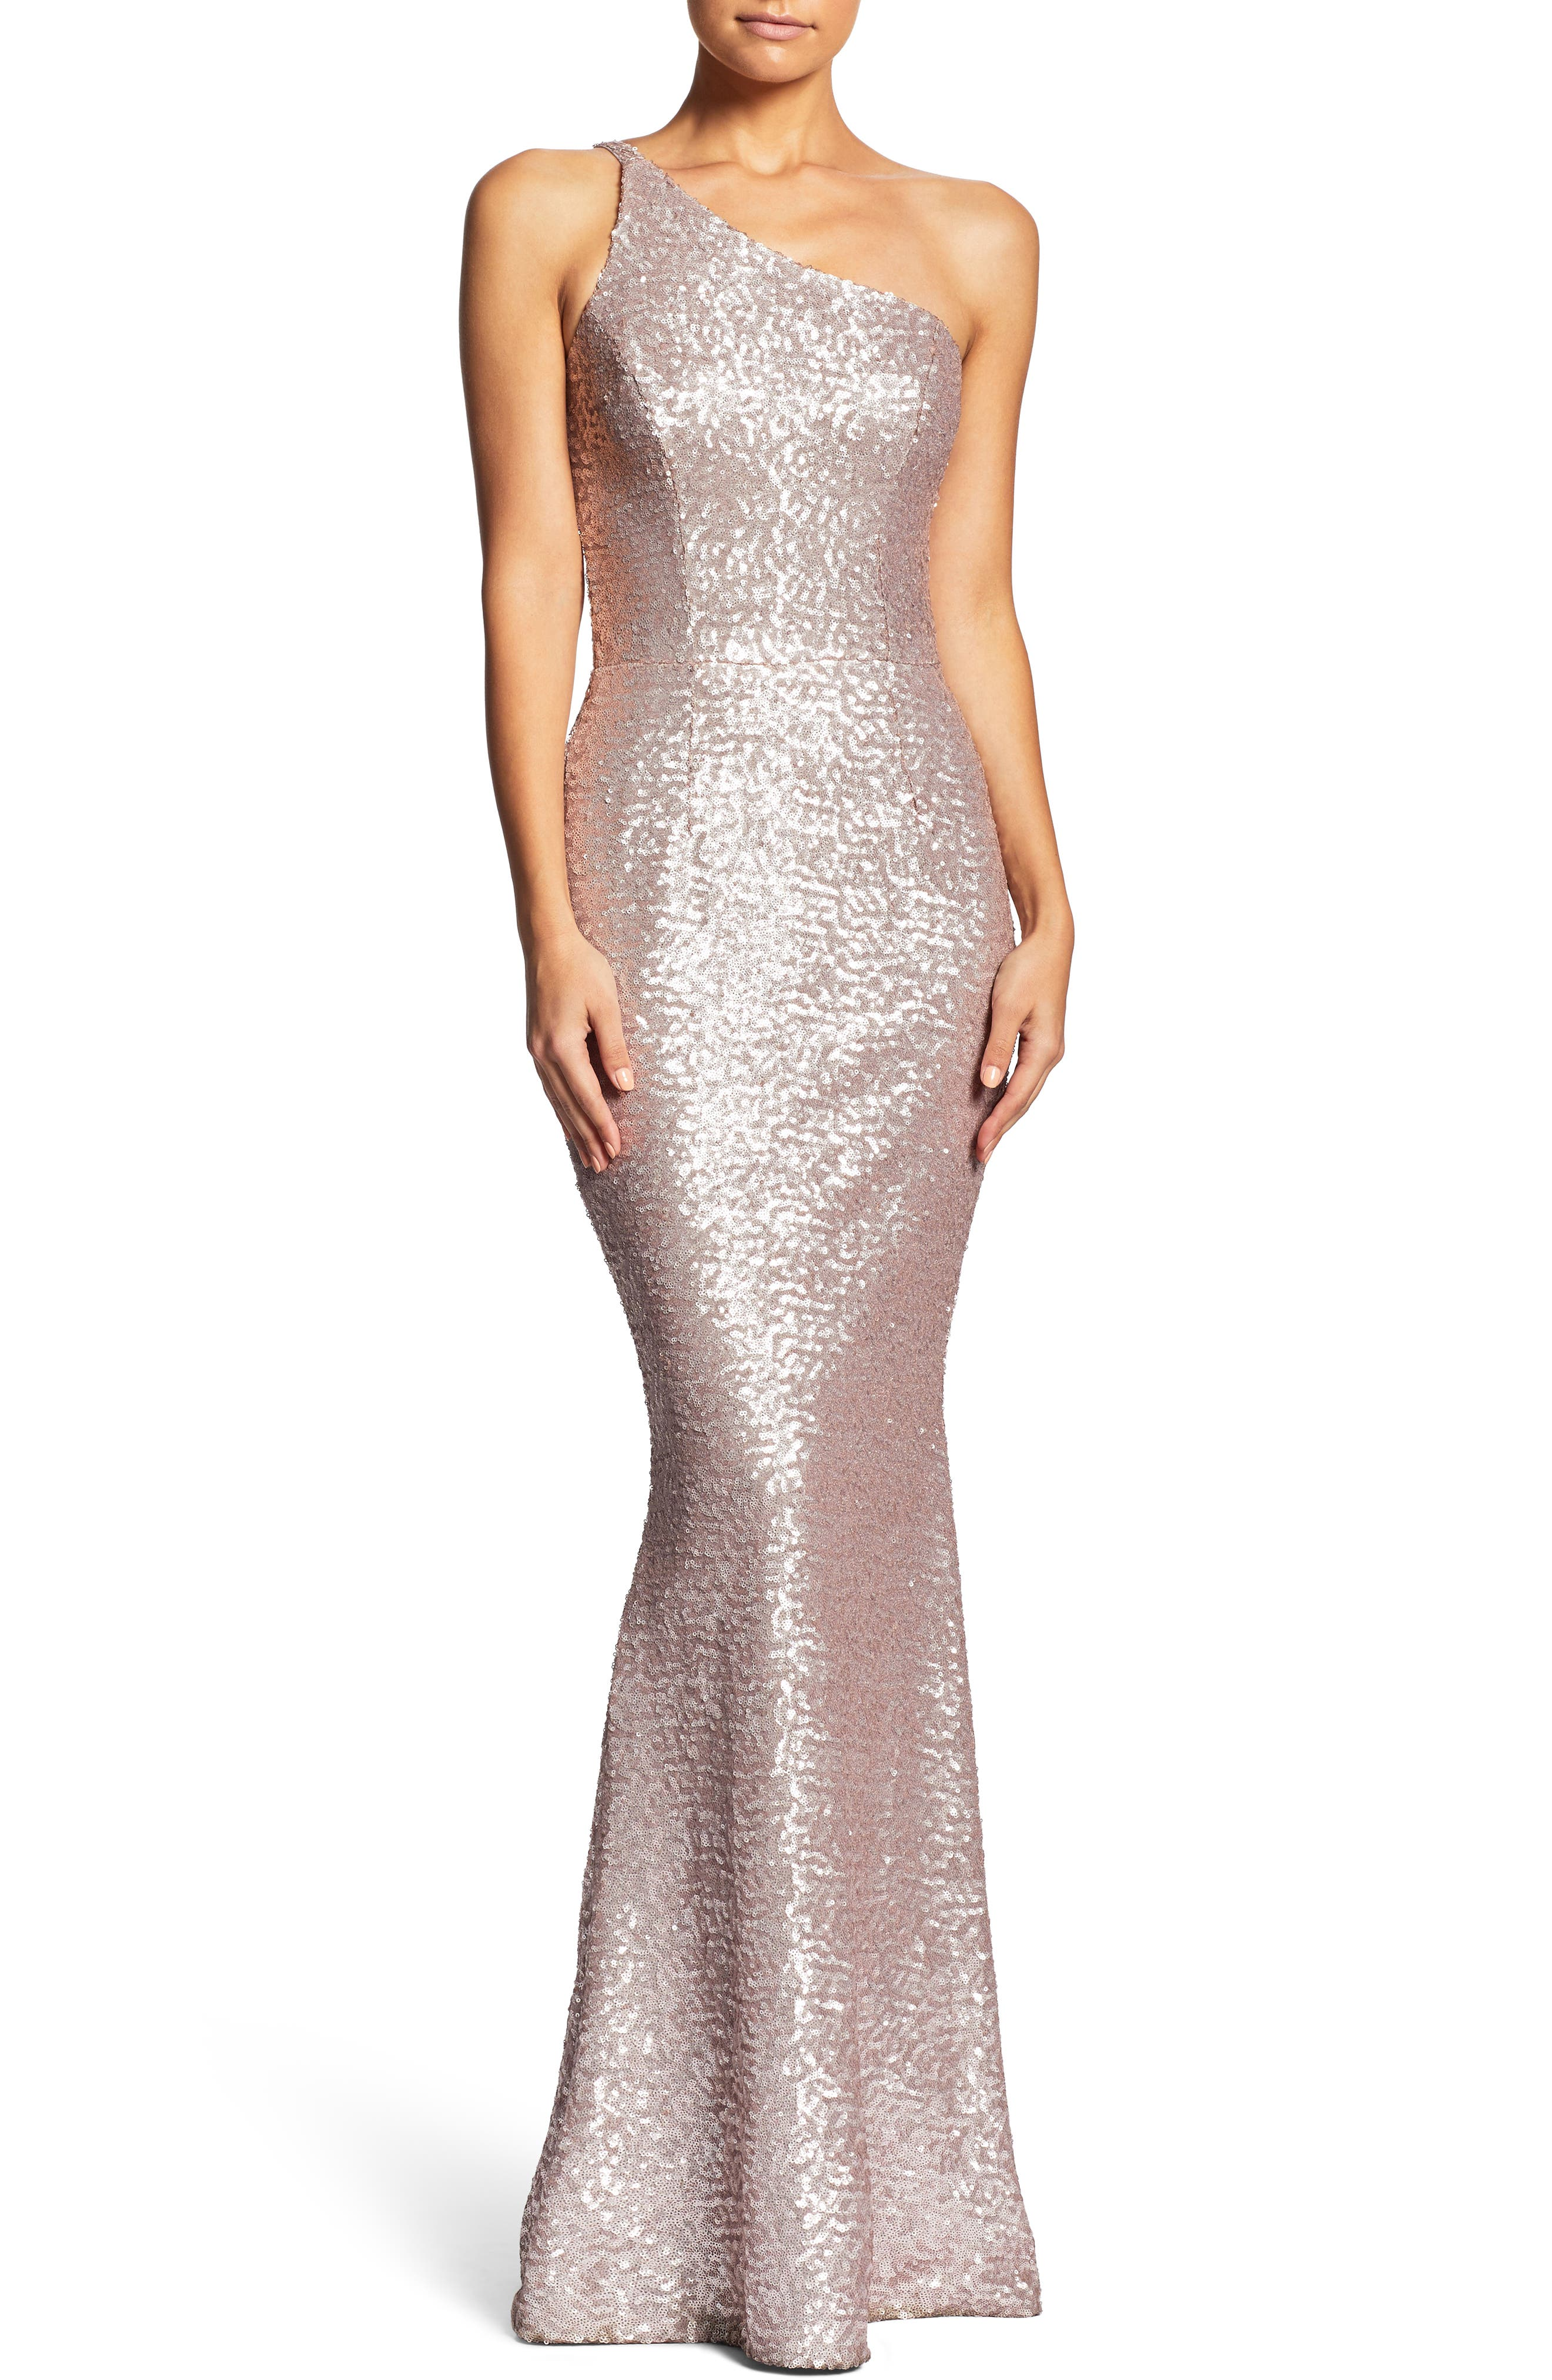 Bella One-Shoulder Mermaid Gown,                         Main,                         color, Ice Pink